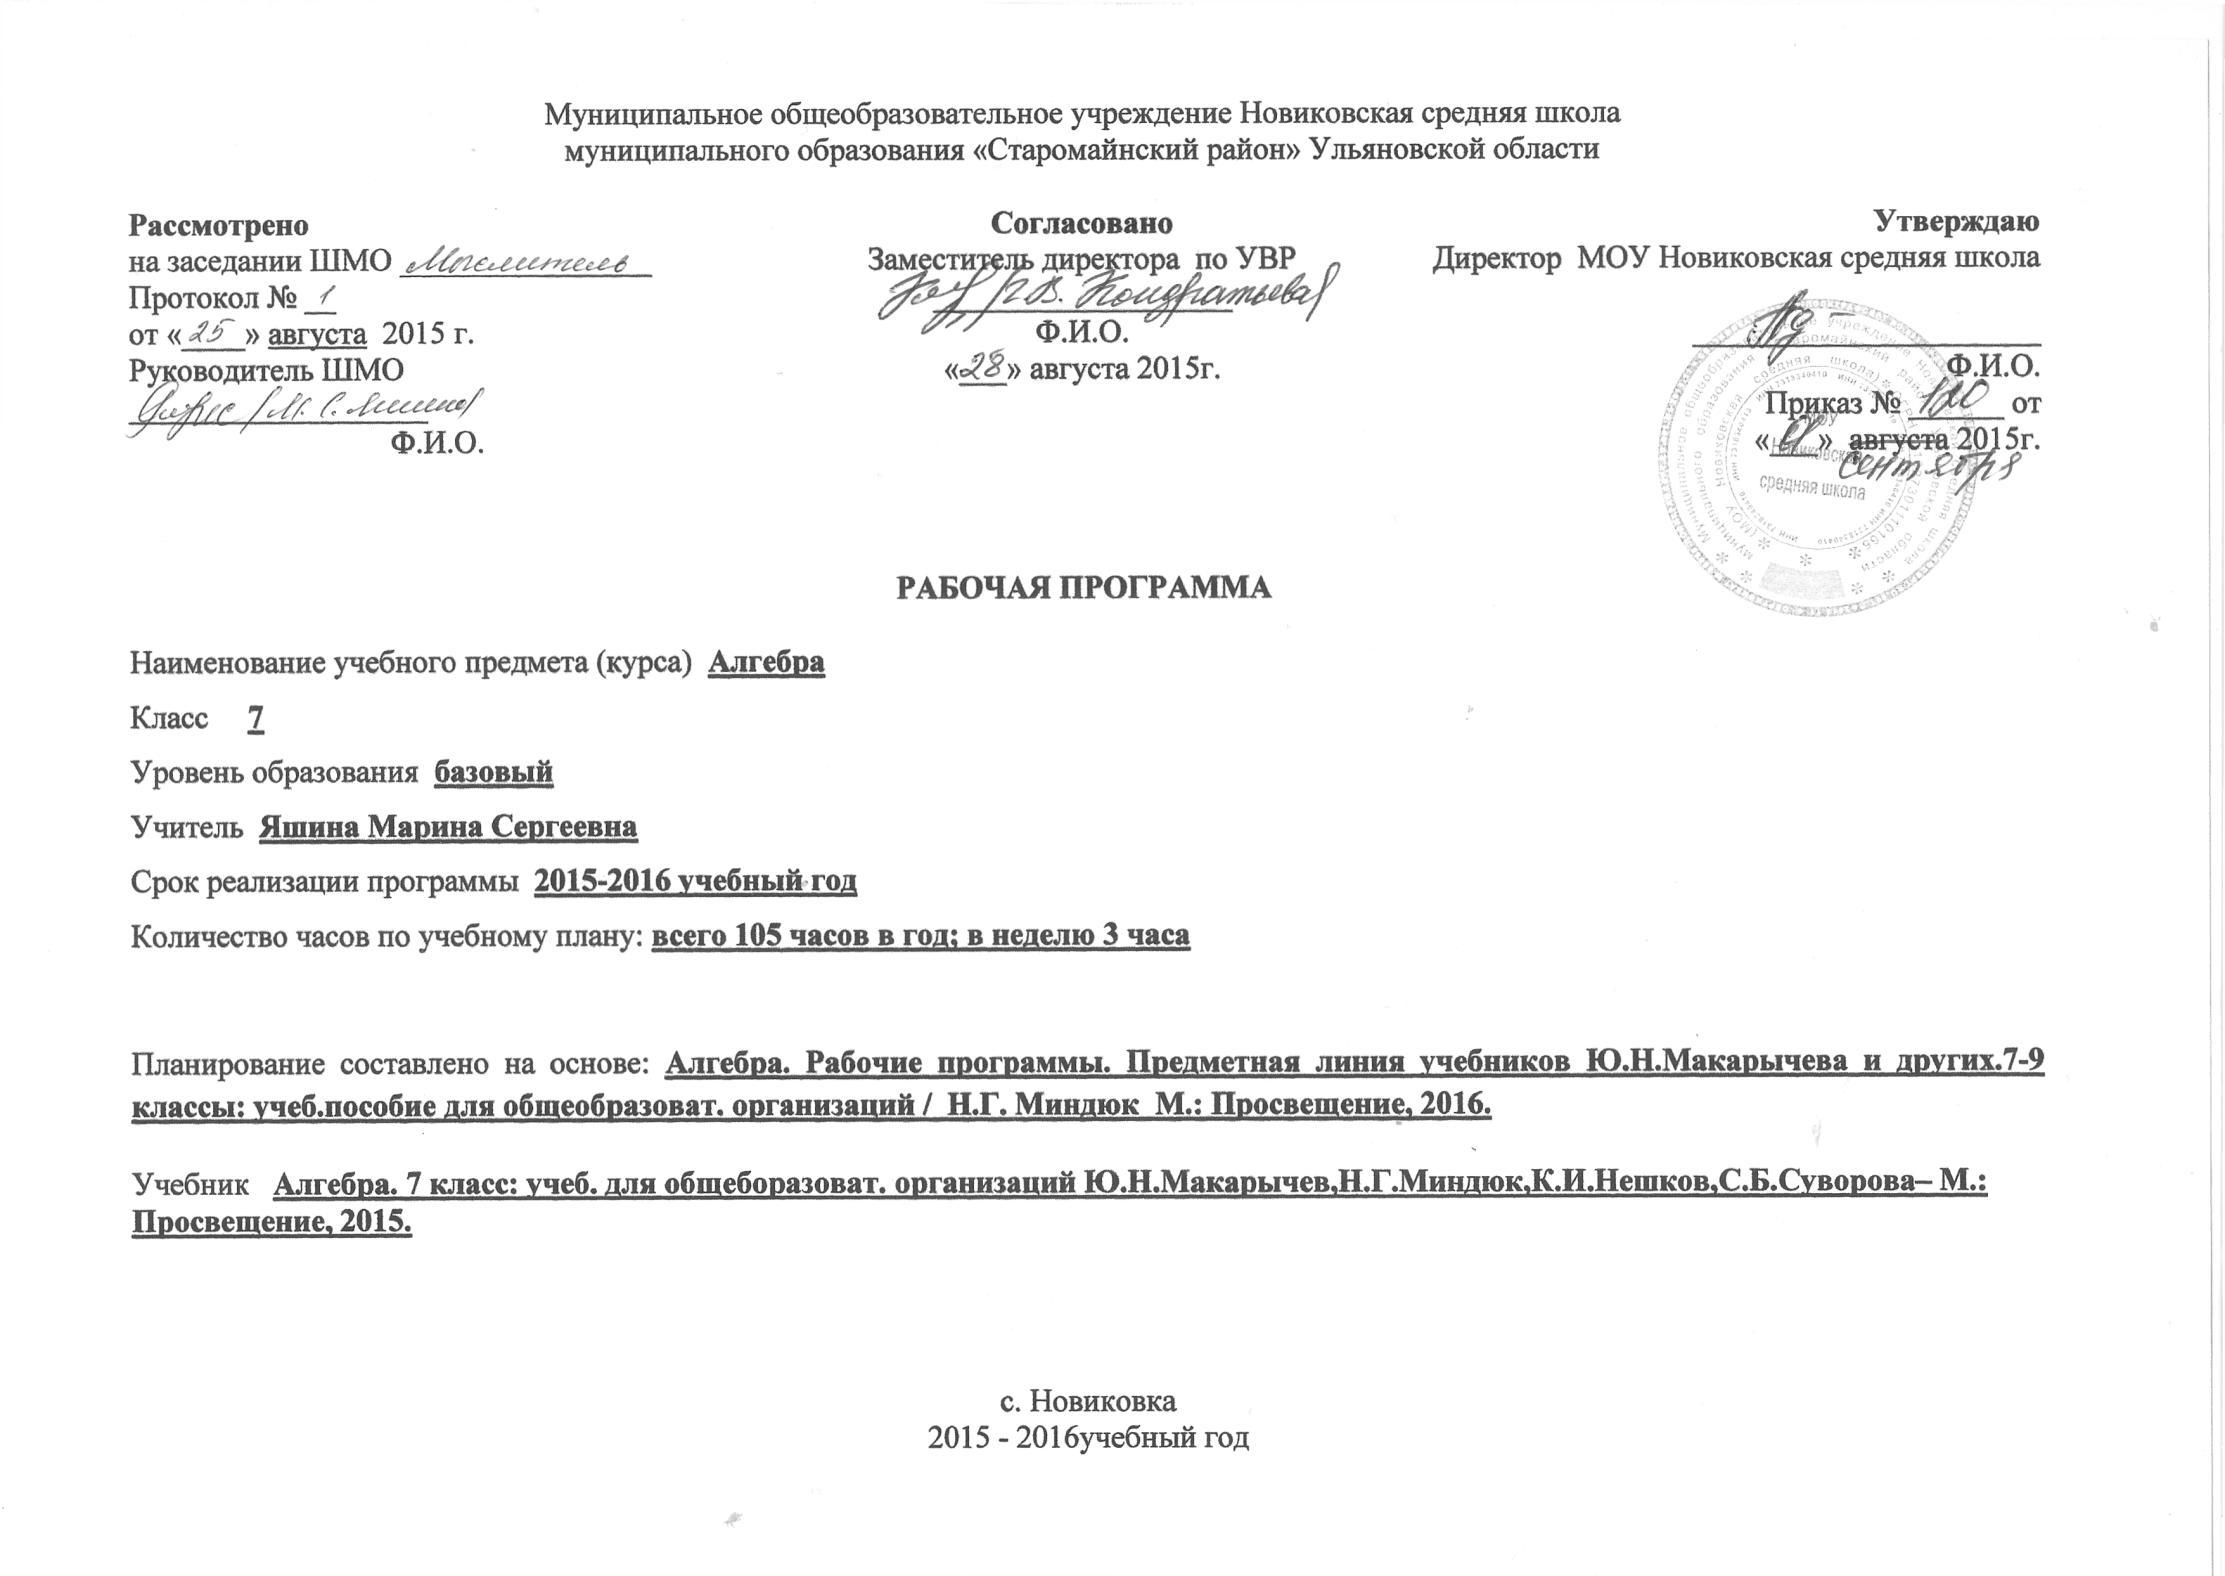 C:\Users\user\Documents\МС скан\рп\3.tif